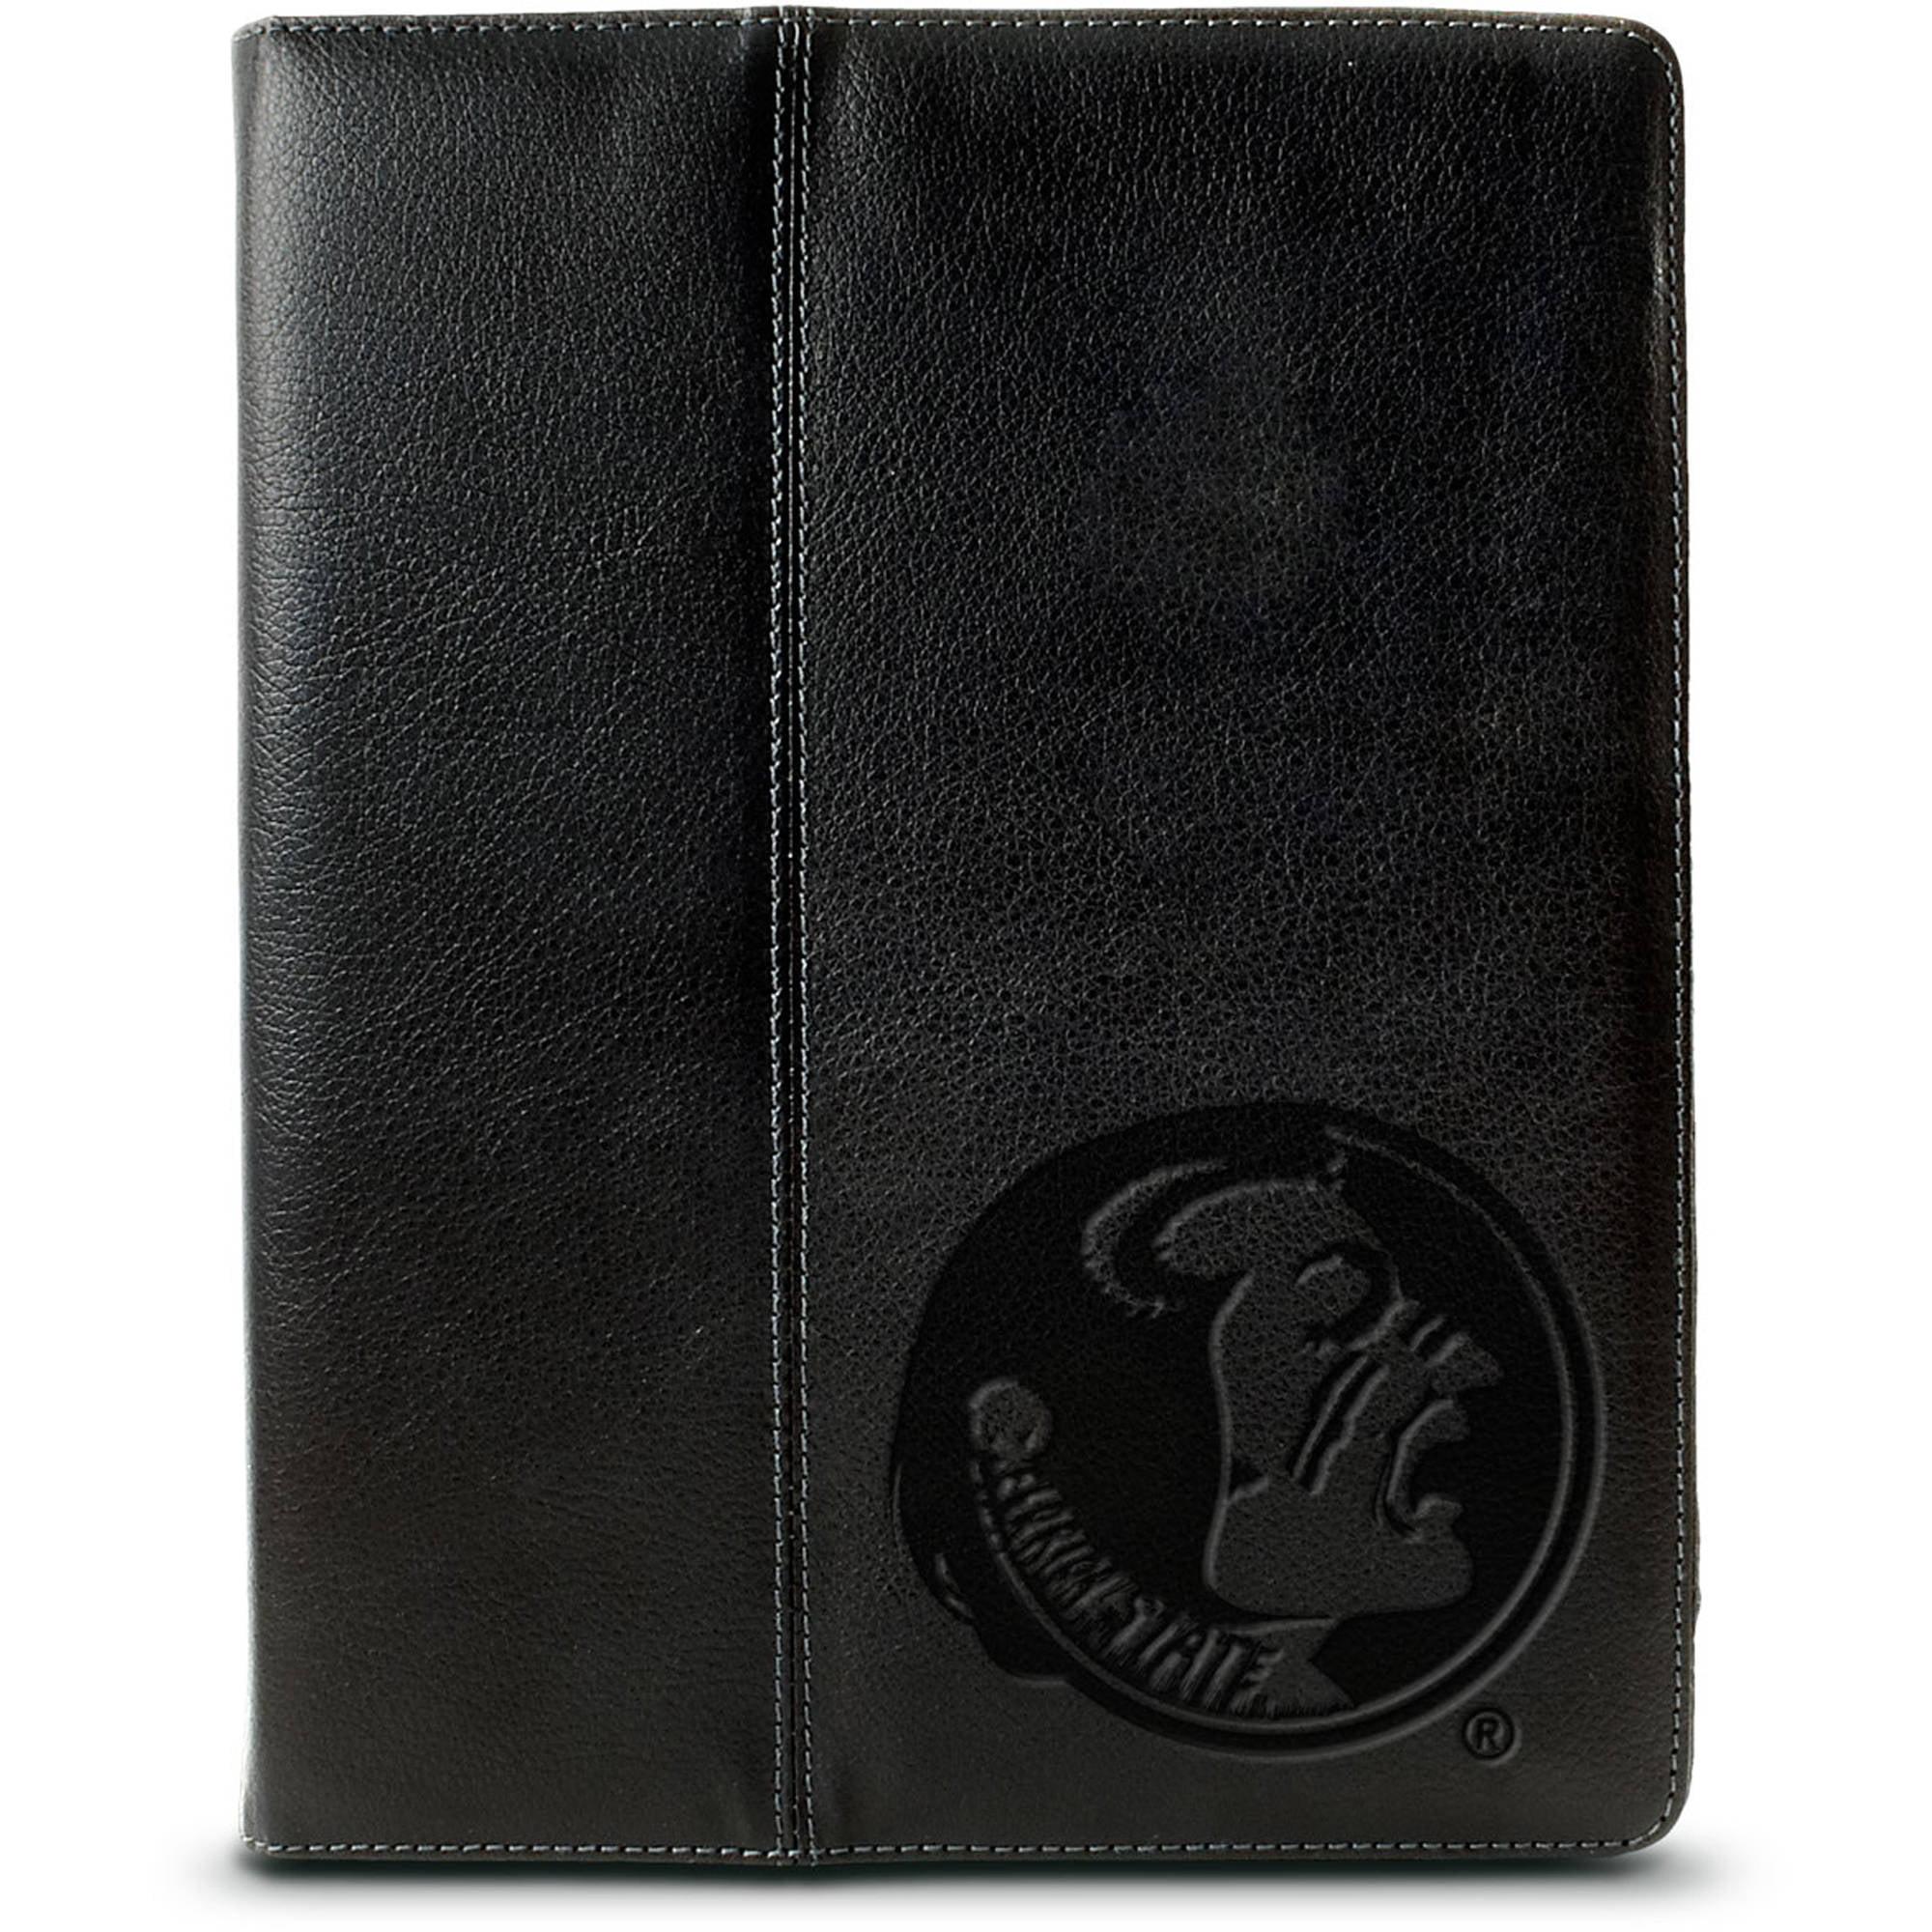 Centon iPad Leather Folio Case Florida State University